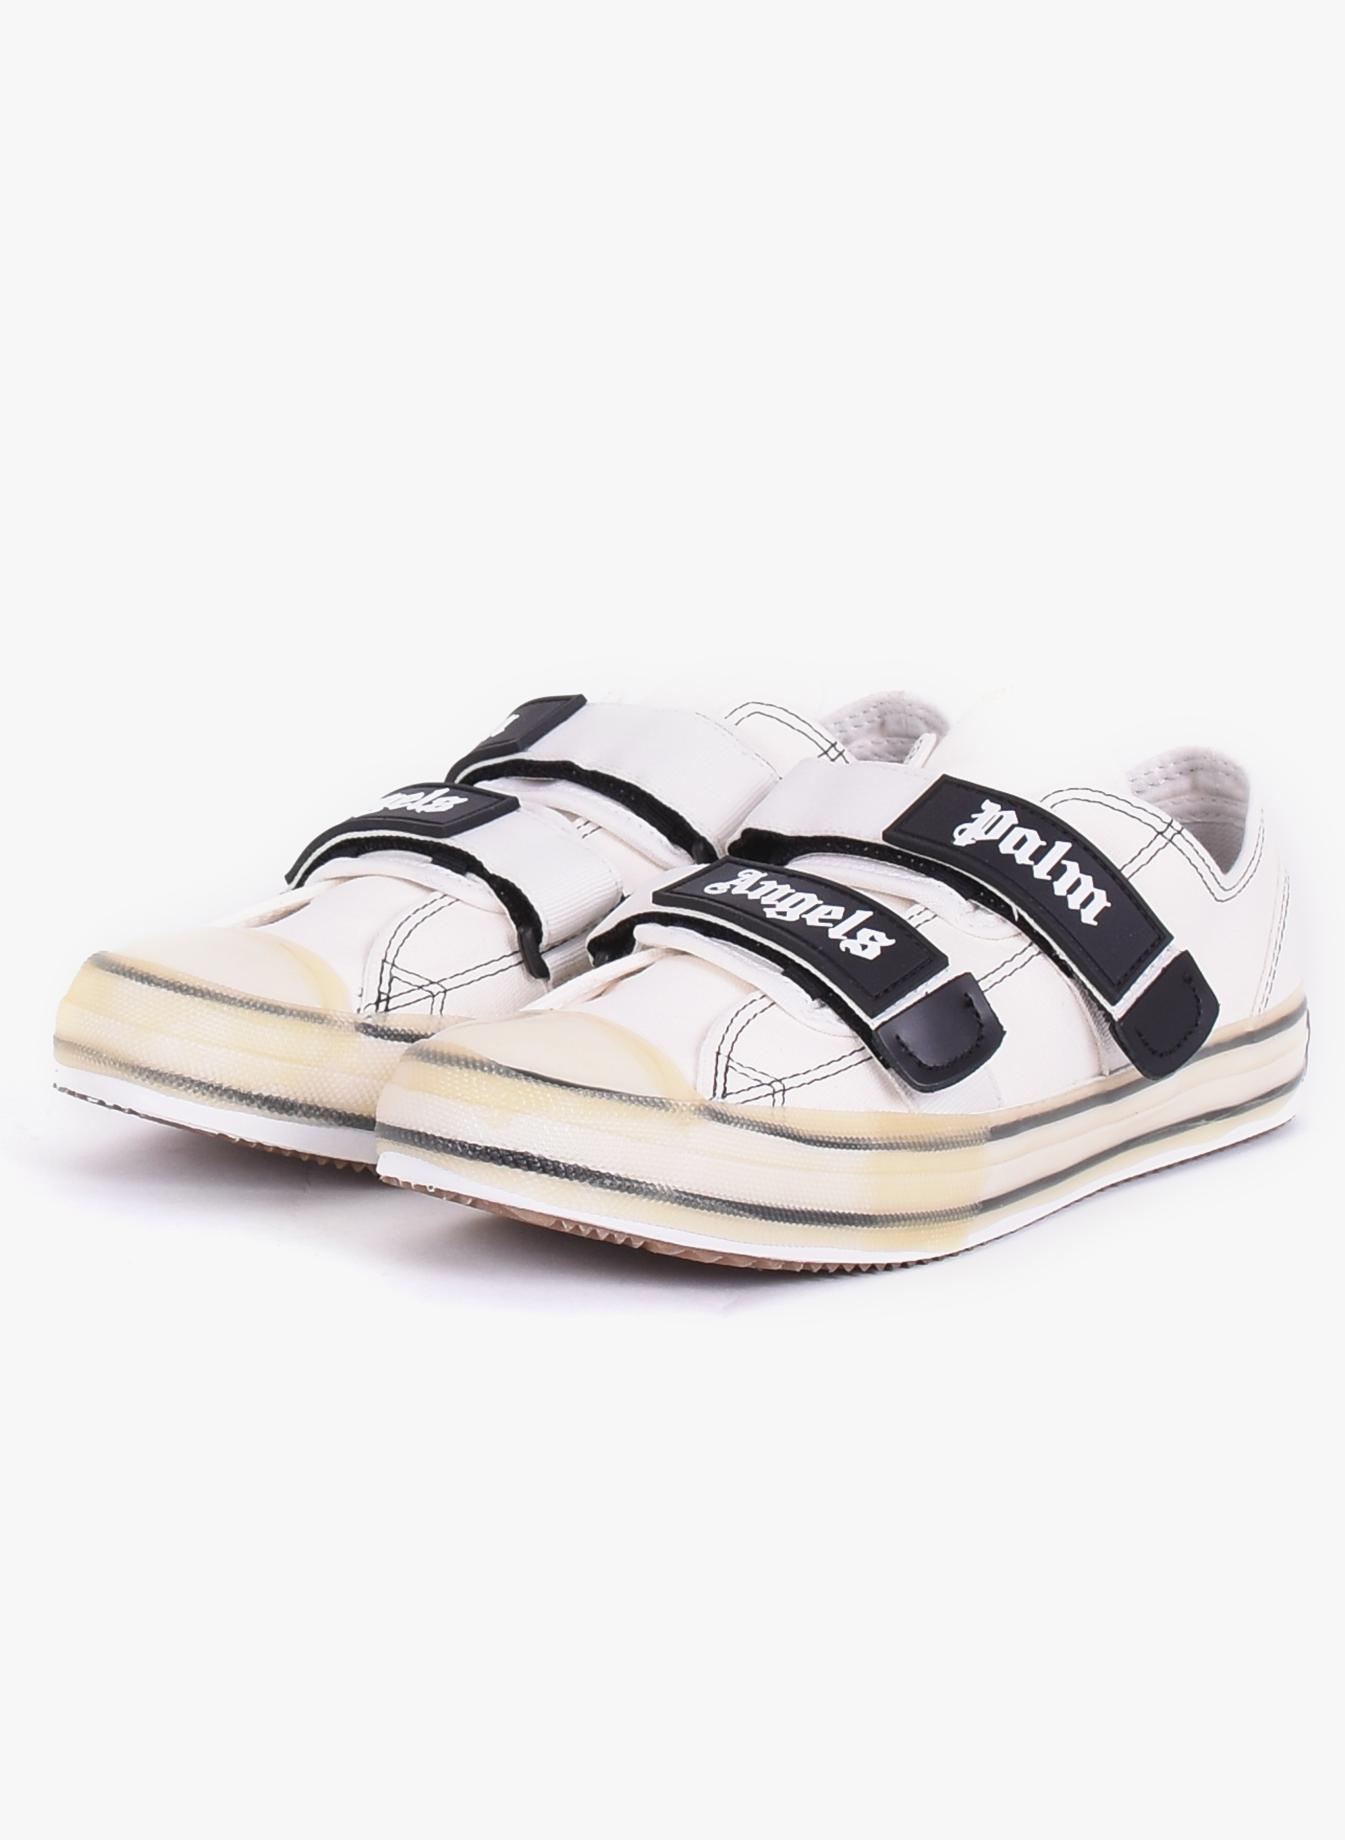 Palm Angels 'Velcro Vulcanized' Sneaker